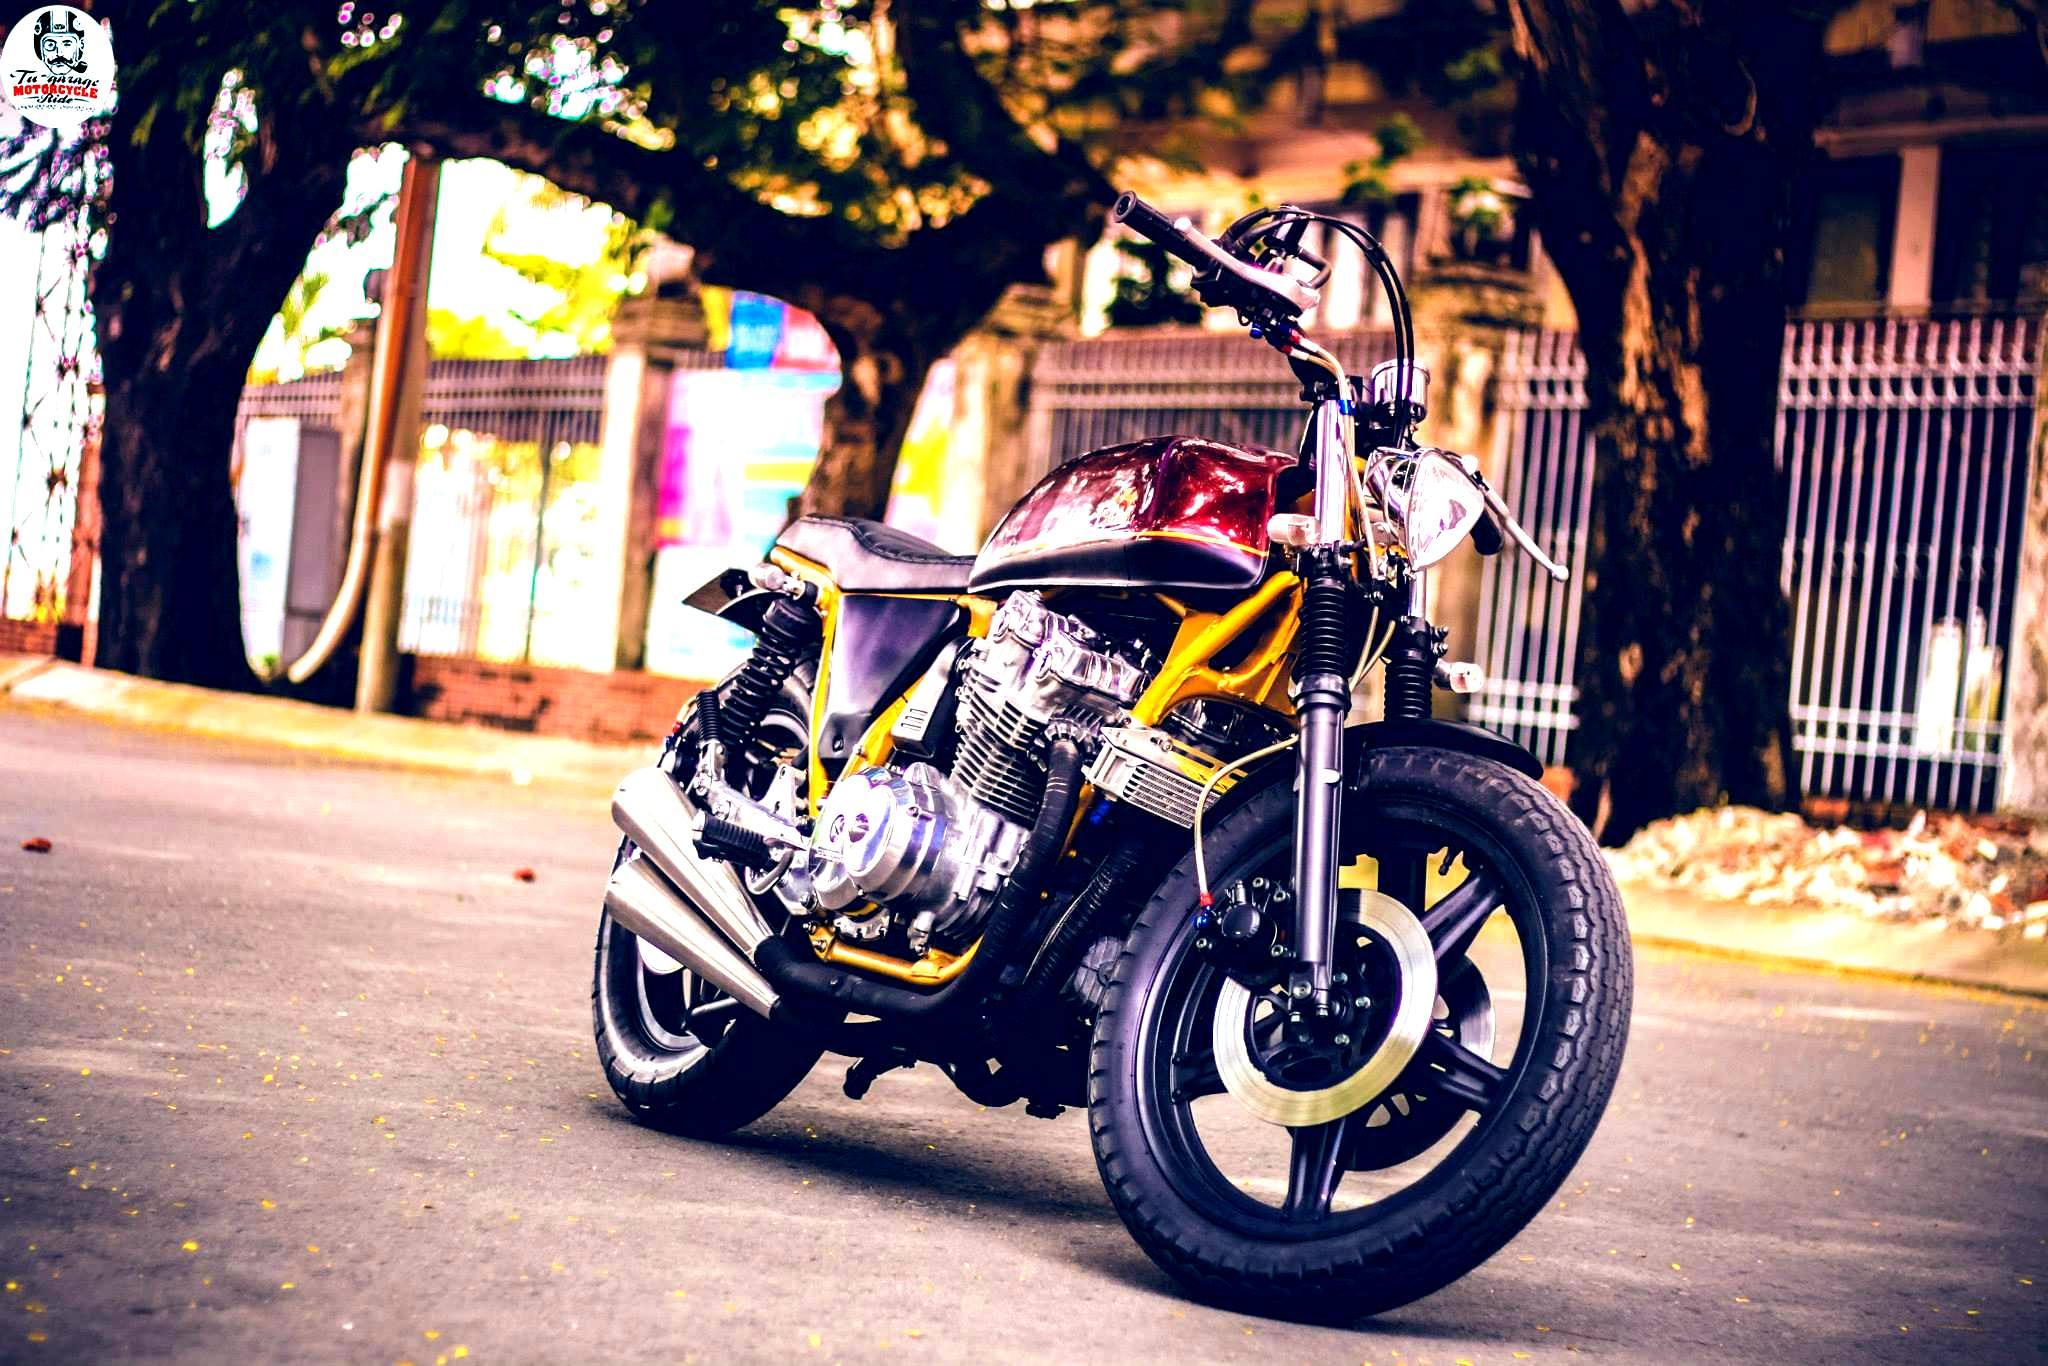 Street Tracker Honda CB750F Shows More Vietnamese Custom ...